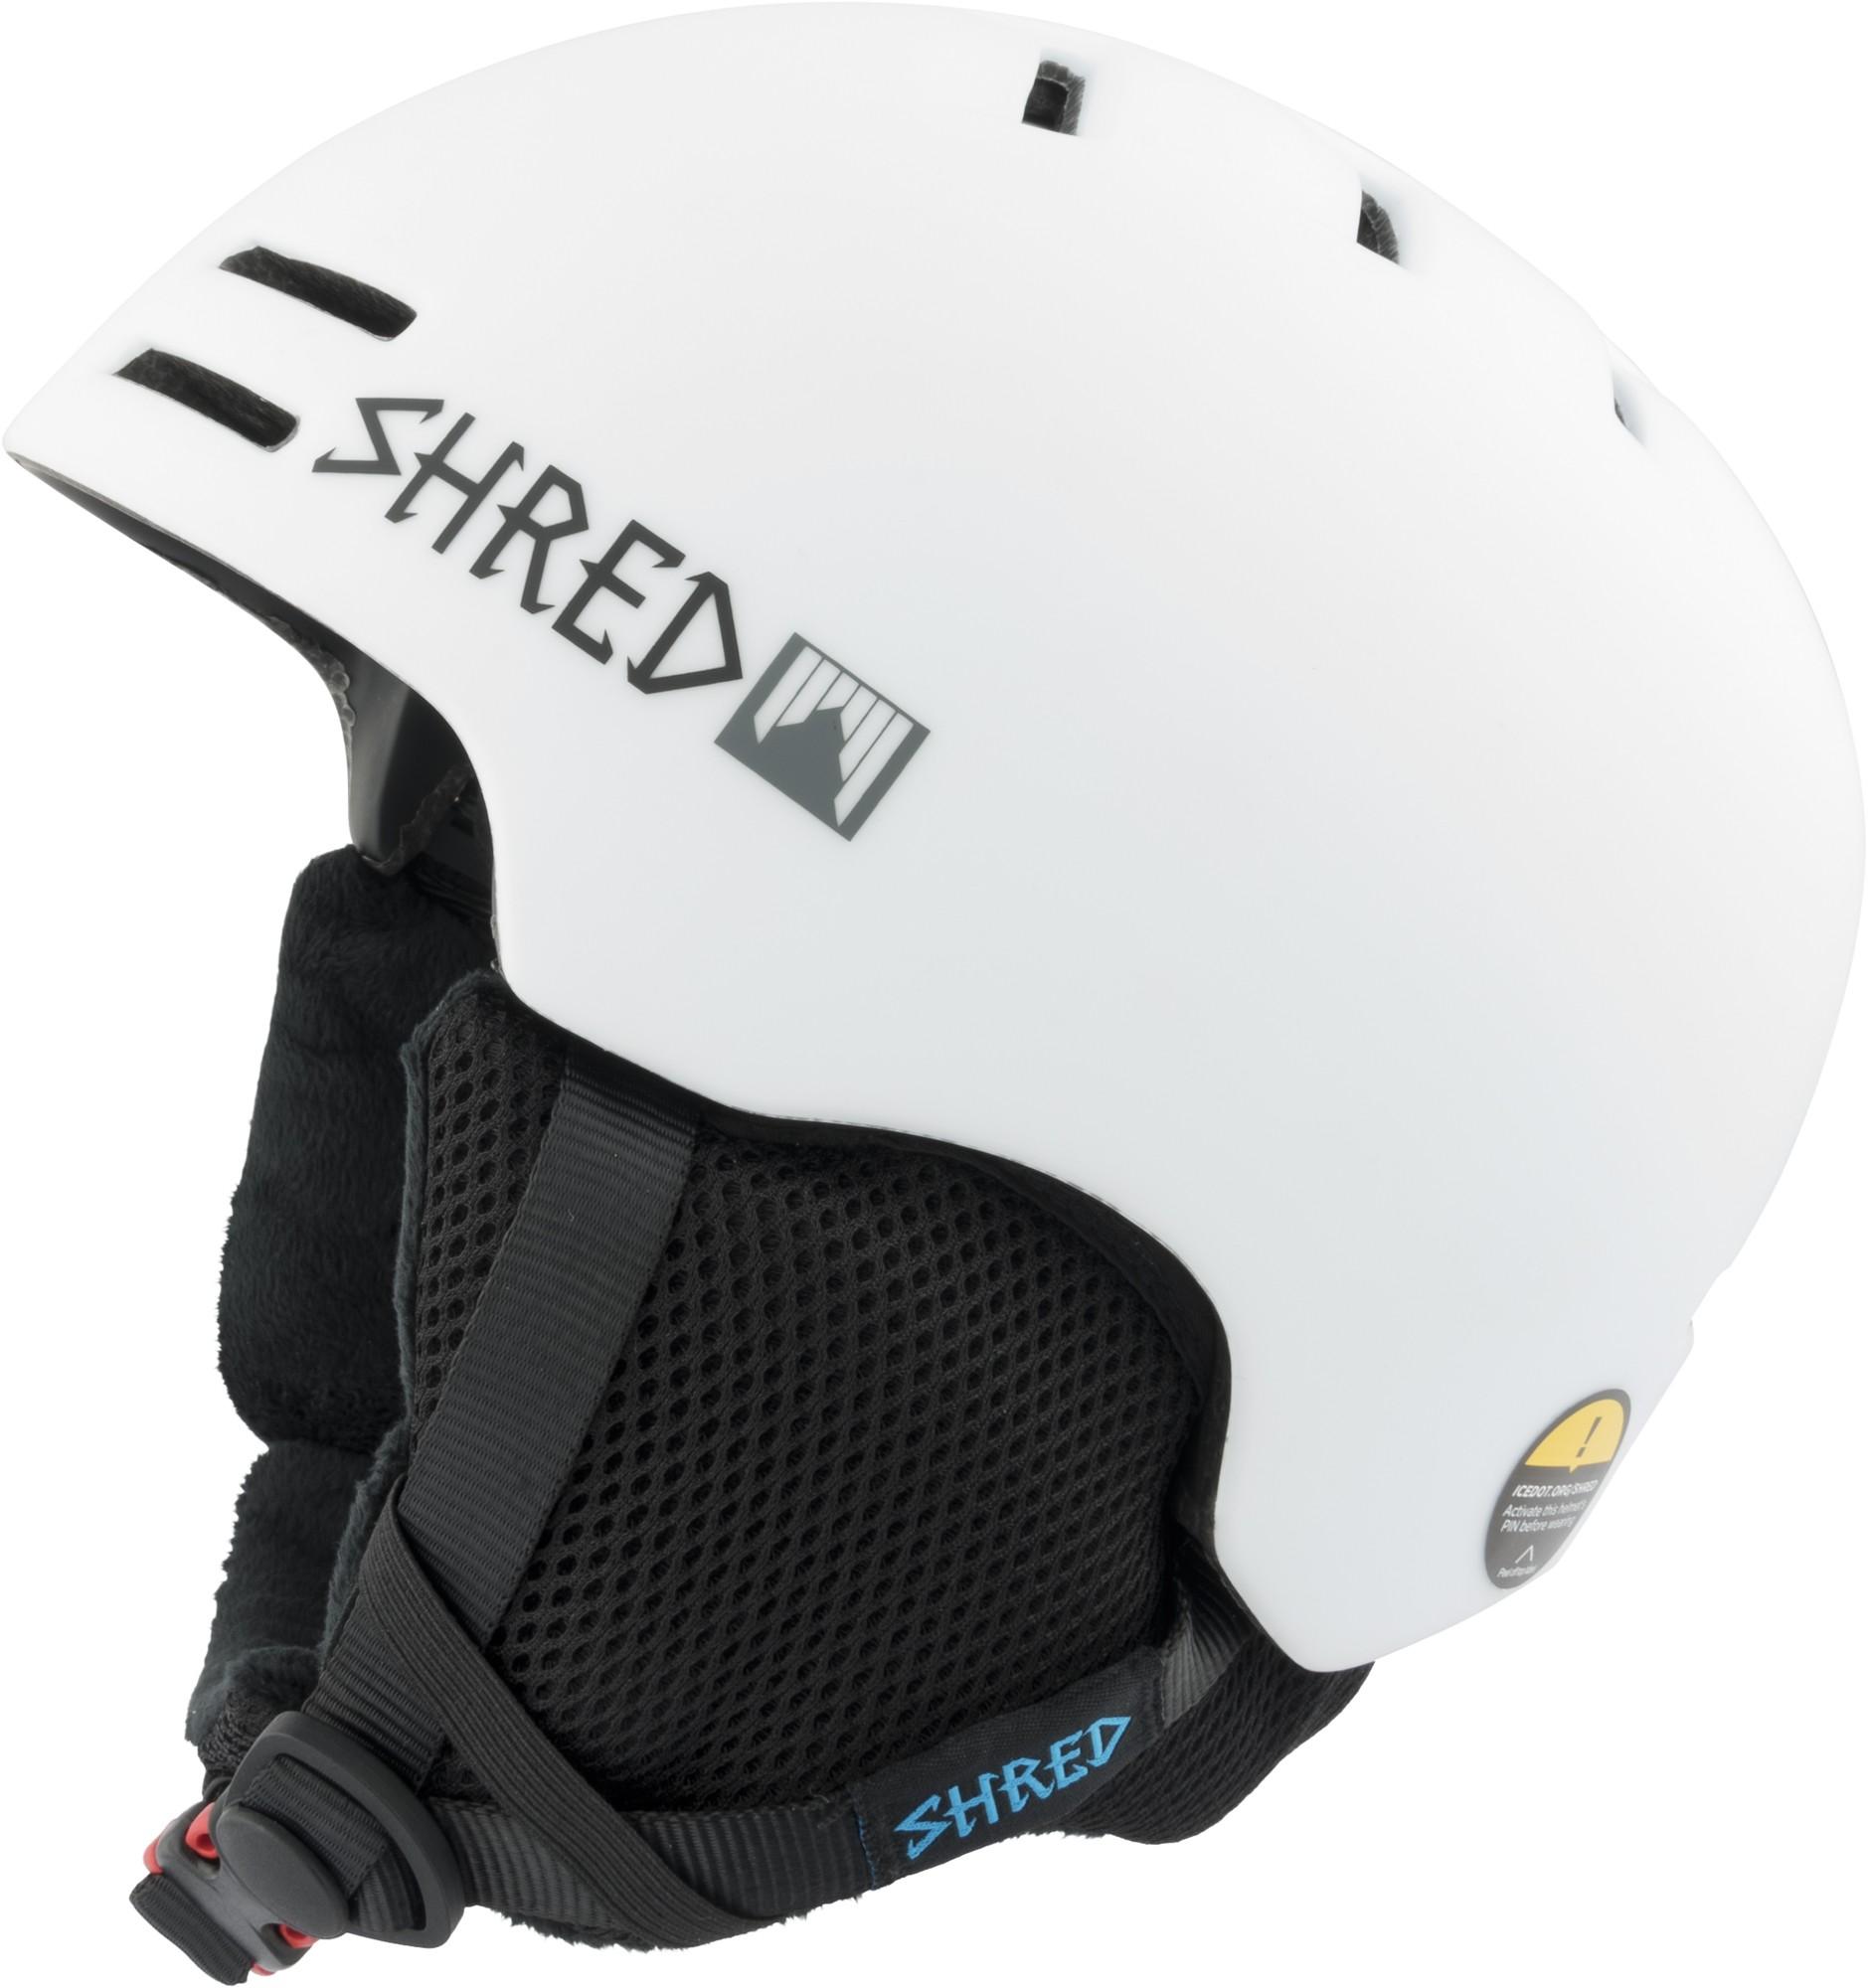 shred slam cap noseason snowplough